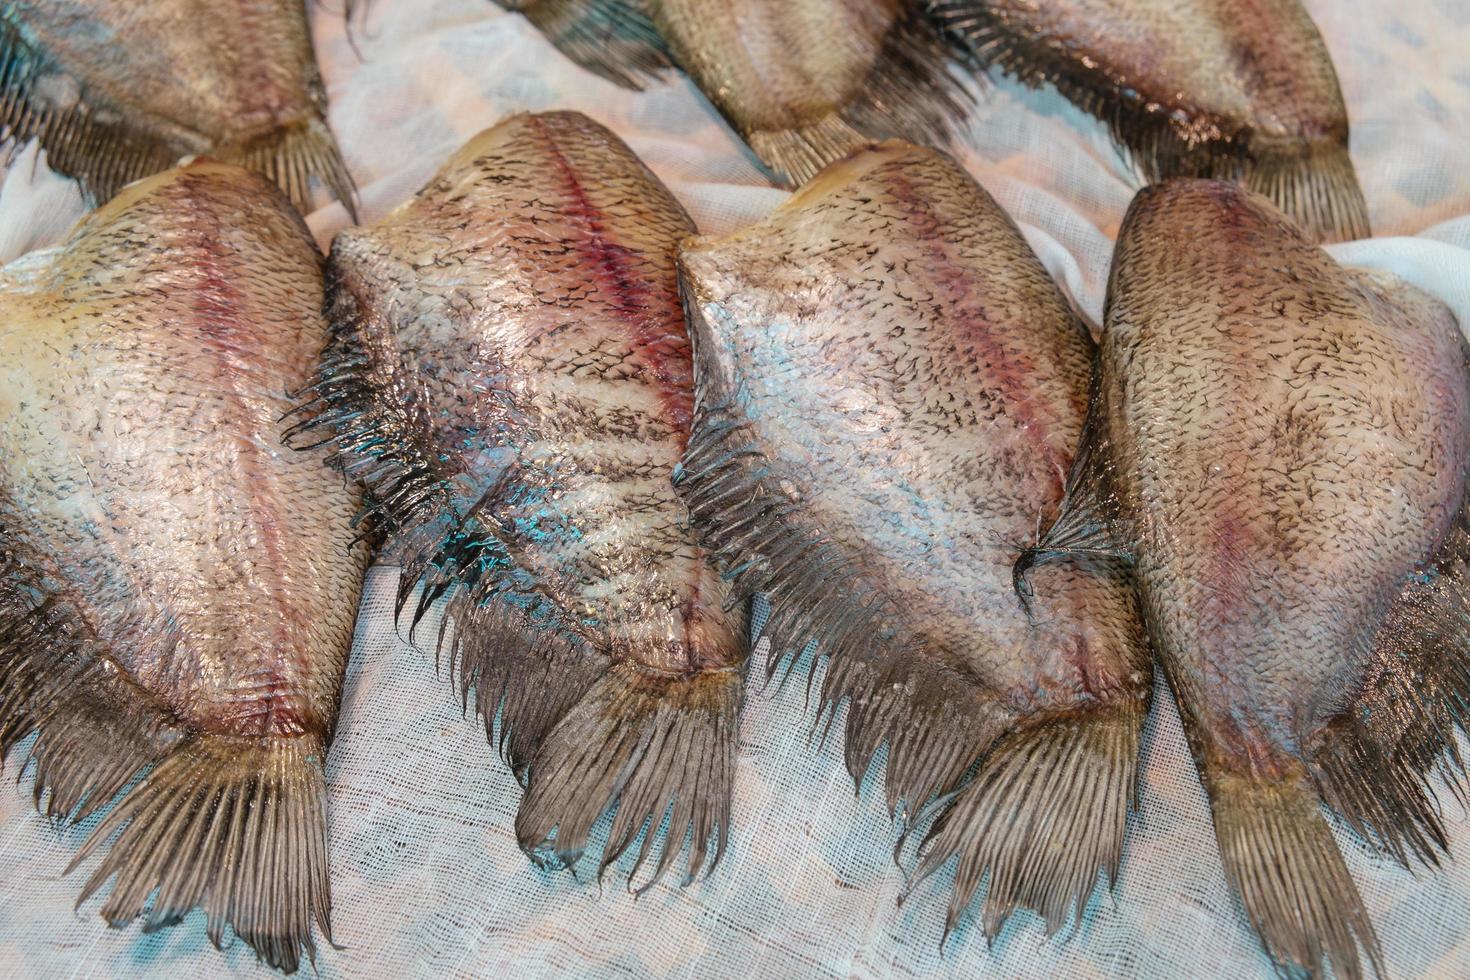 Sun-dried salty raw Snakeskin gourami fishes photo